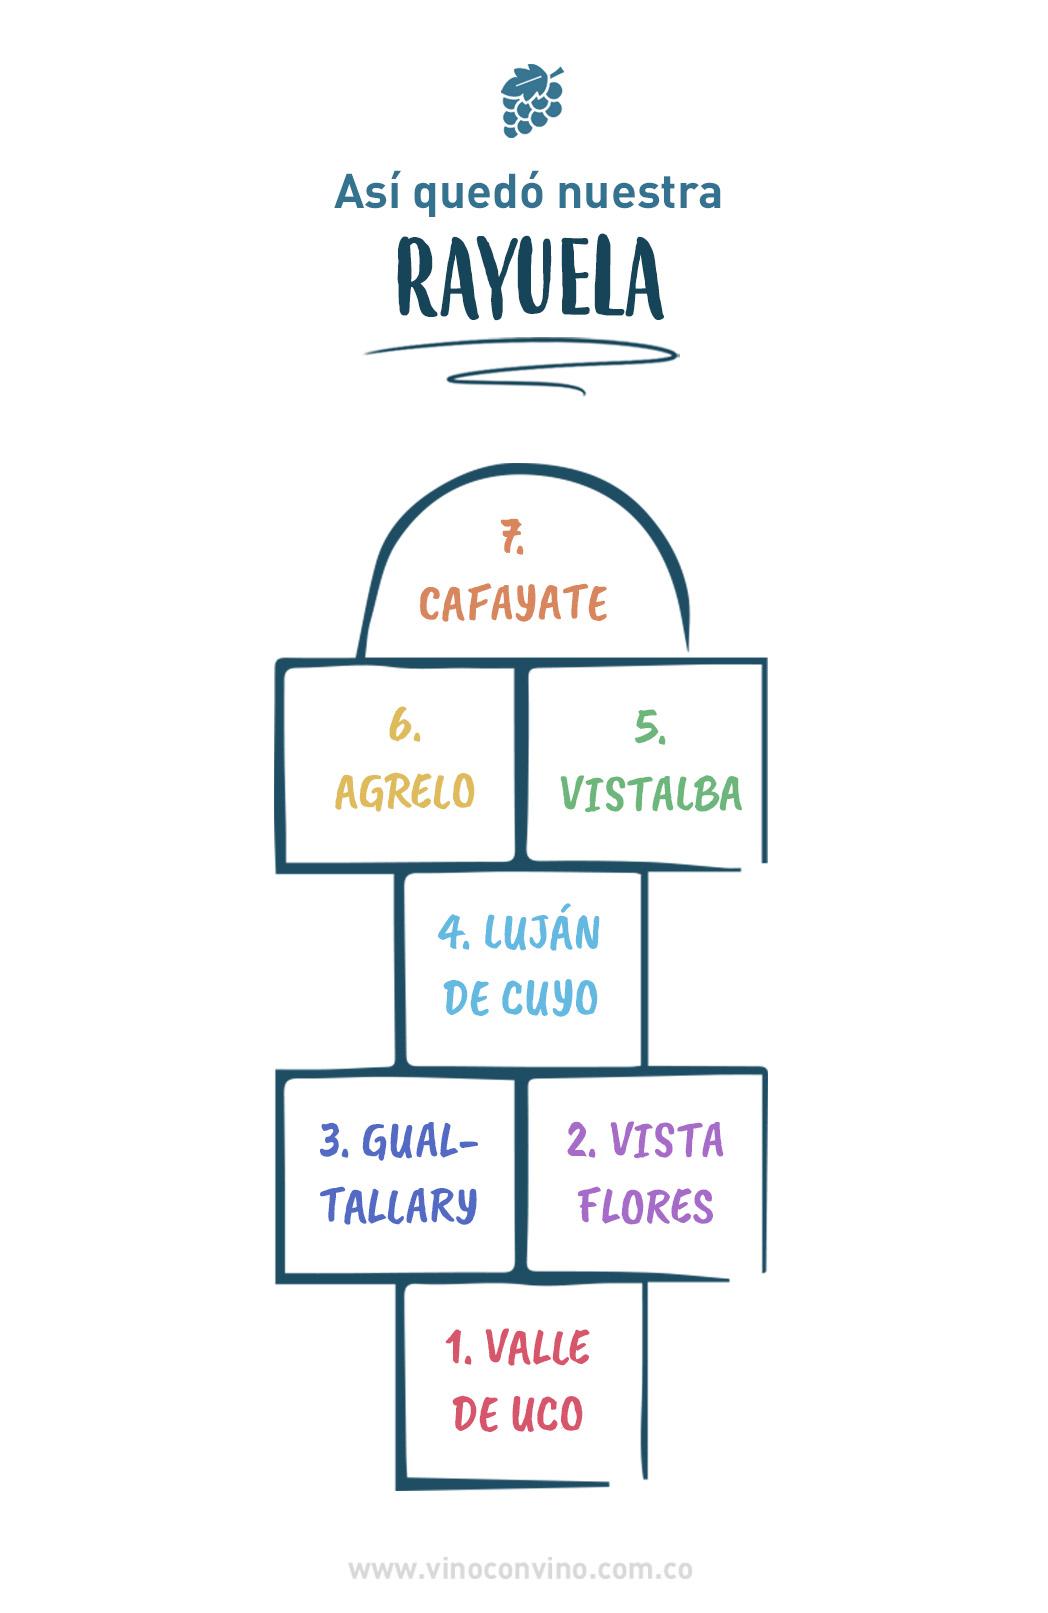 Rayuela. Regiones del vino Argentina